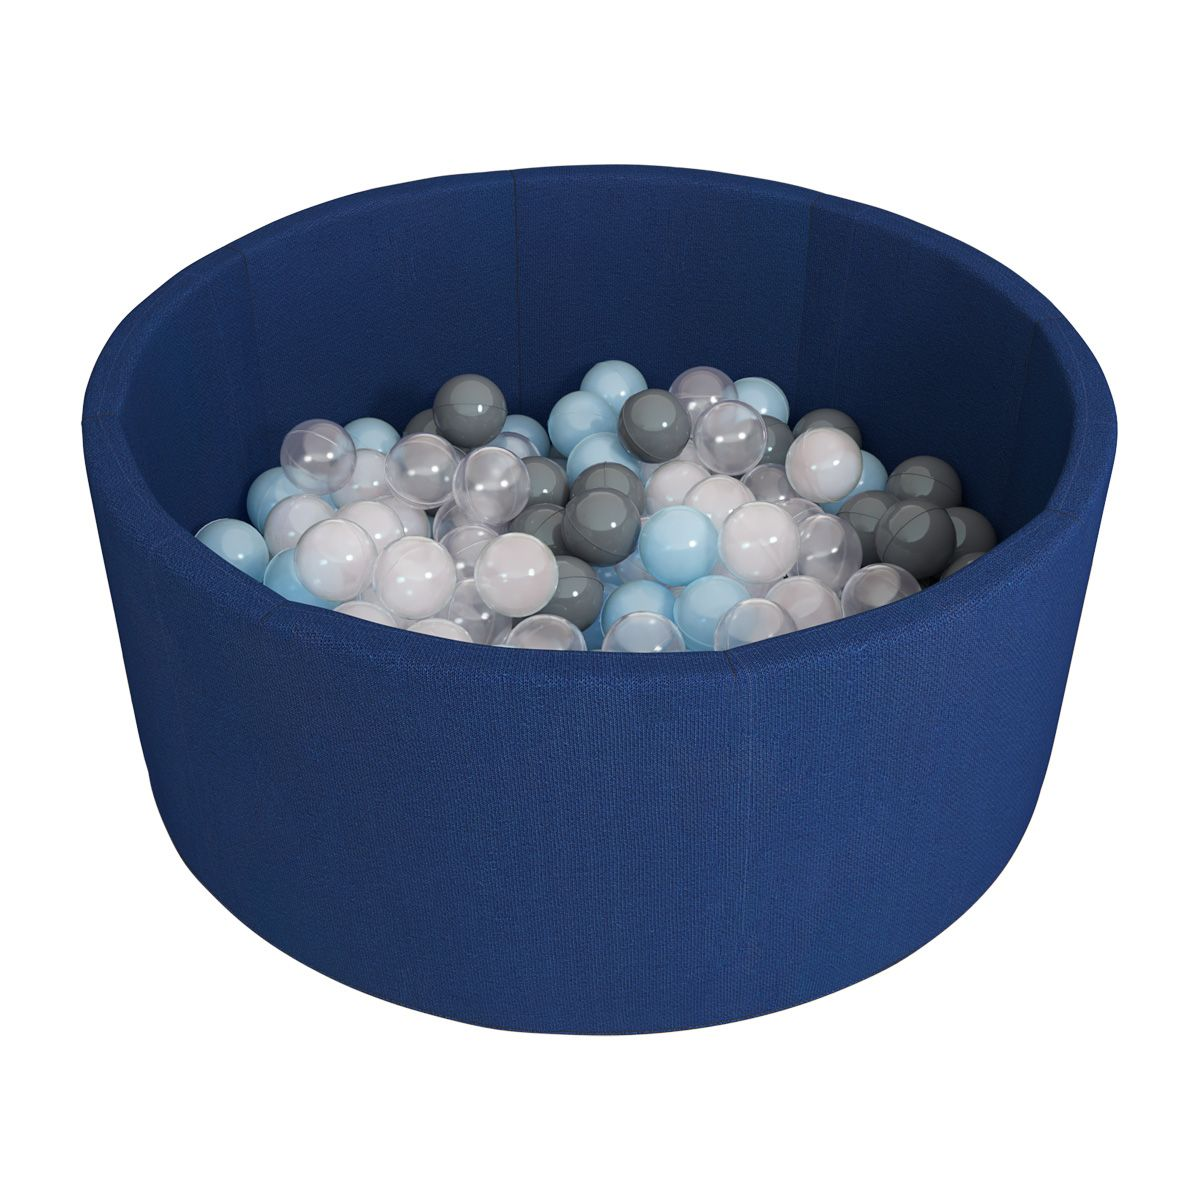 "Romana / Dry pool ""Airpool"", dark blue"